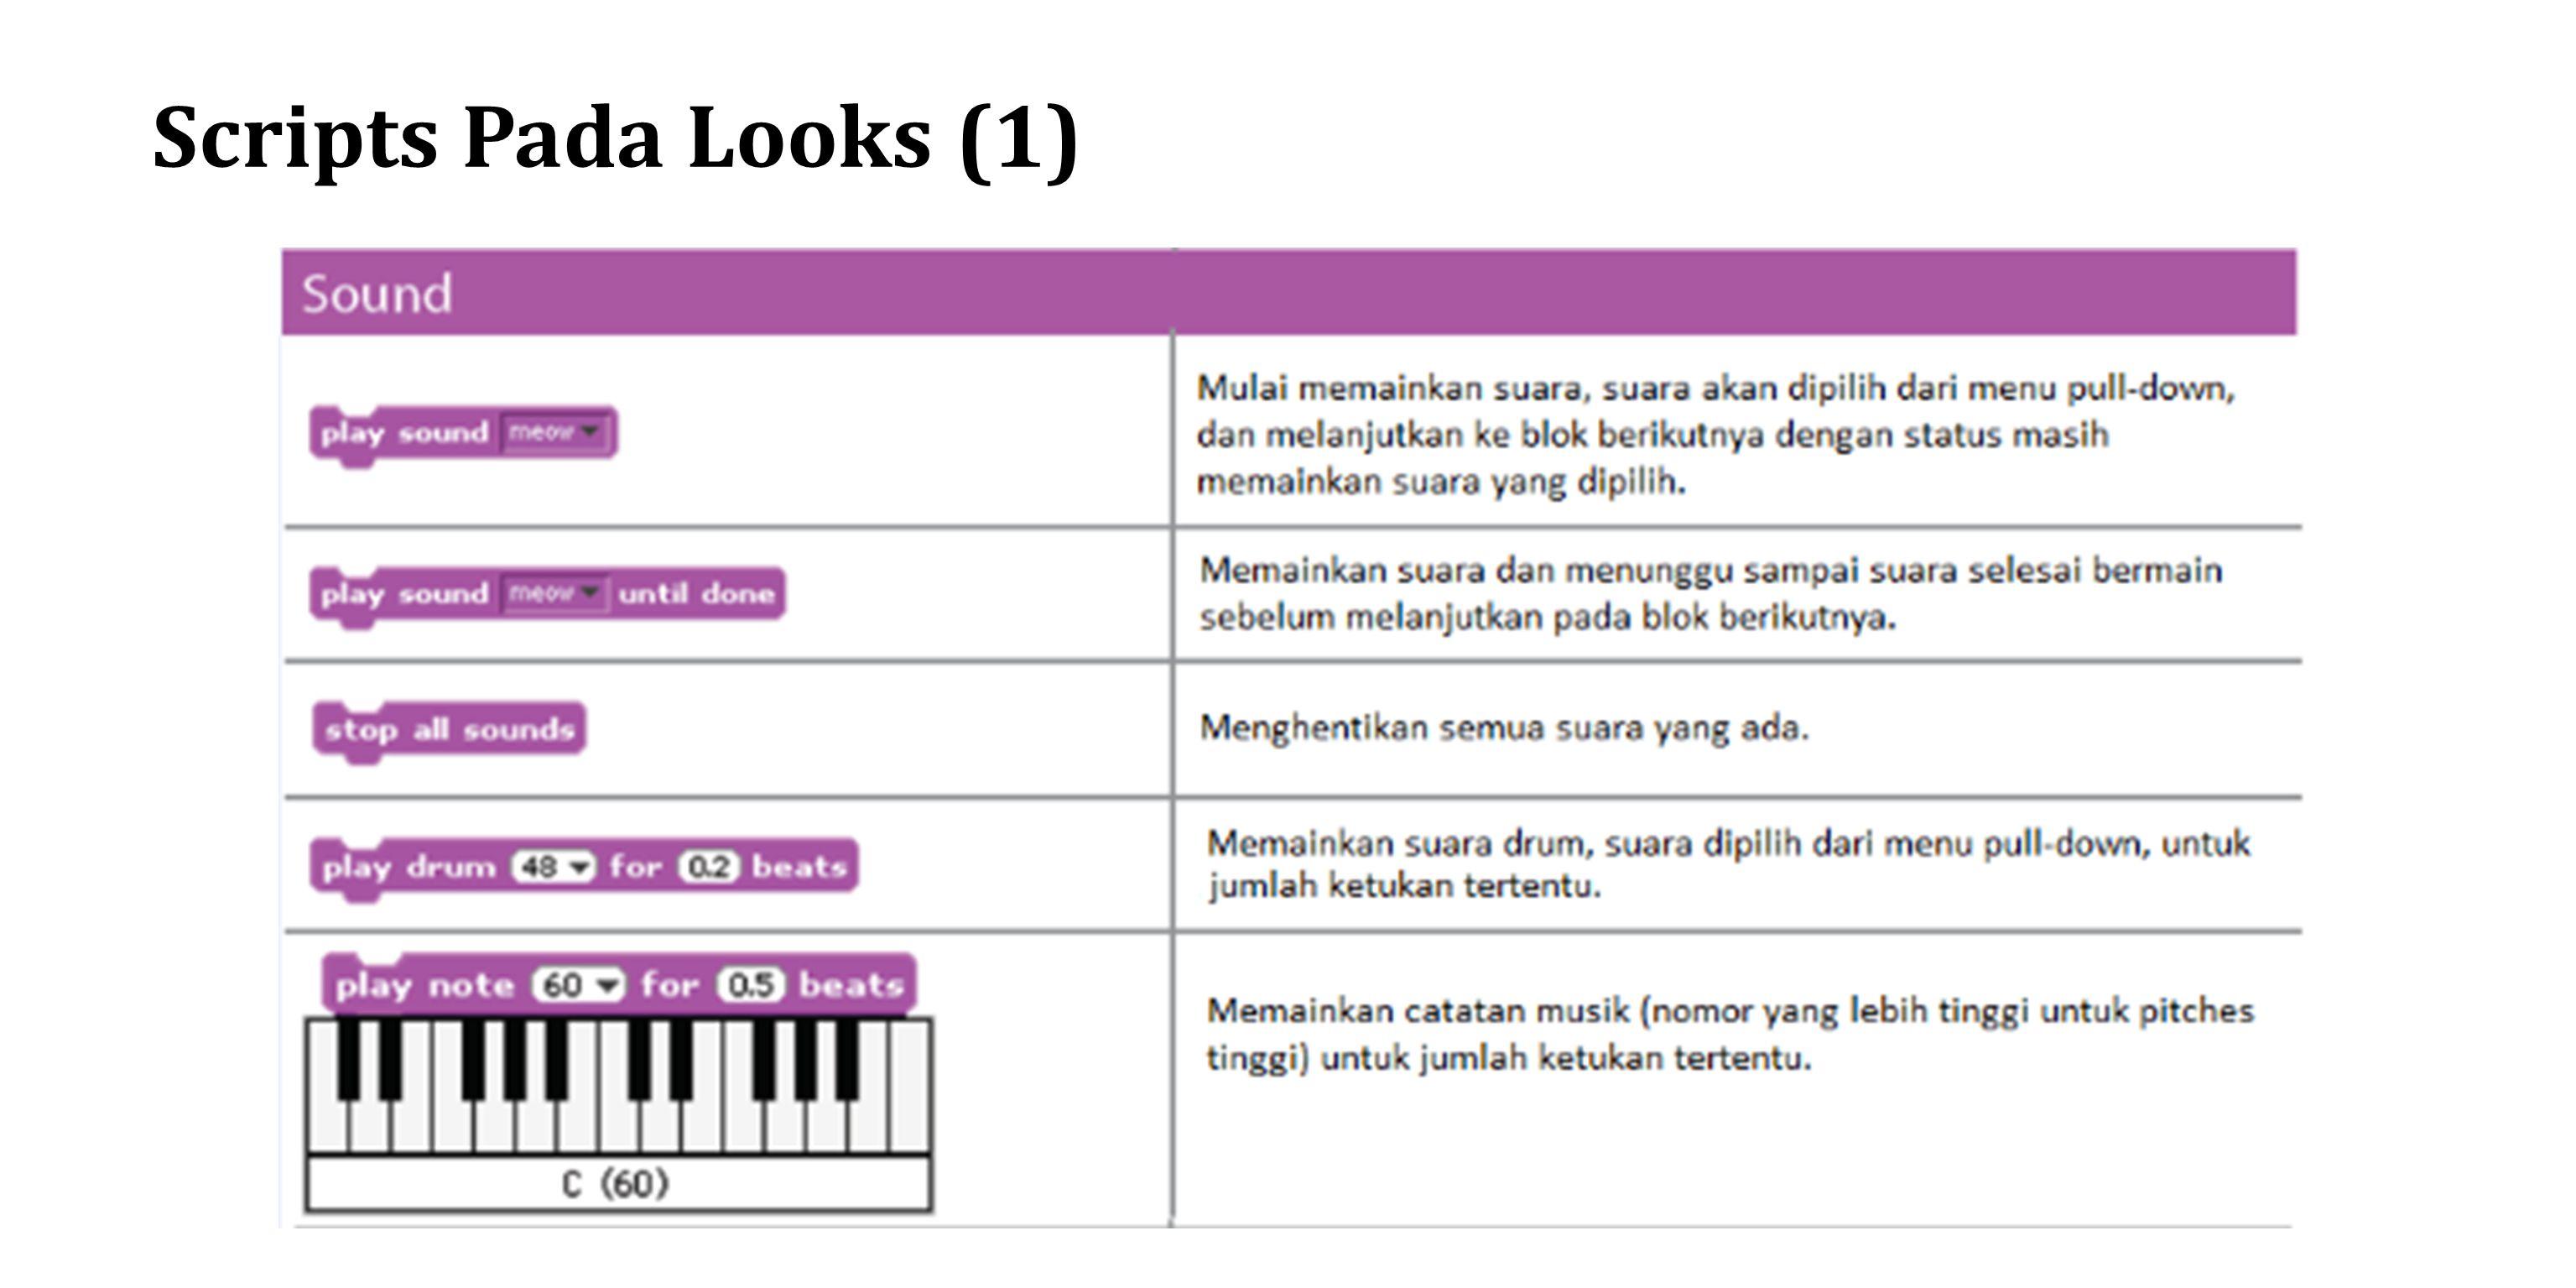 Scripts Pada Looks (1)